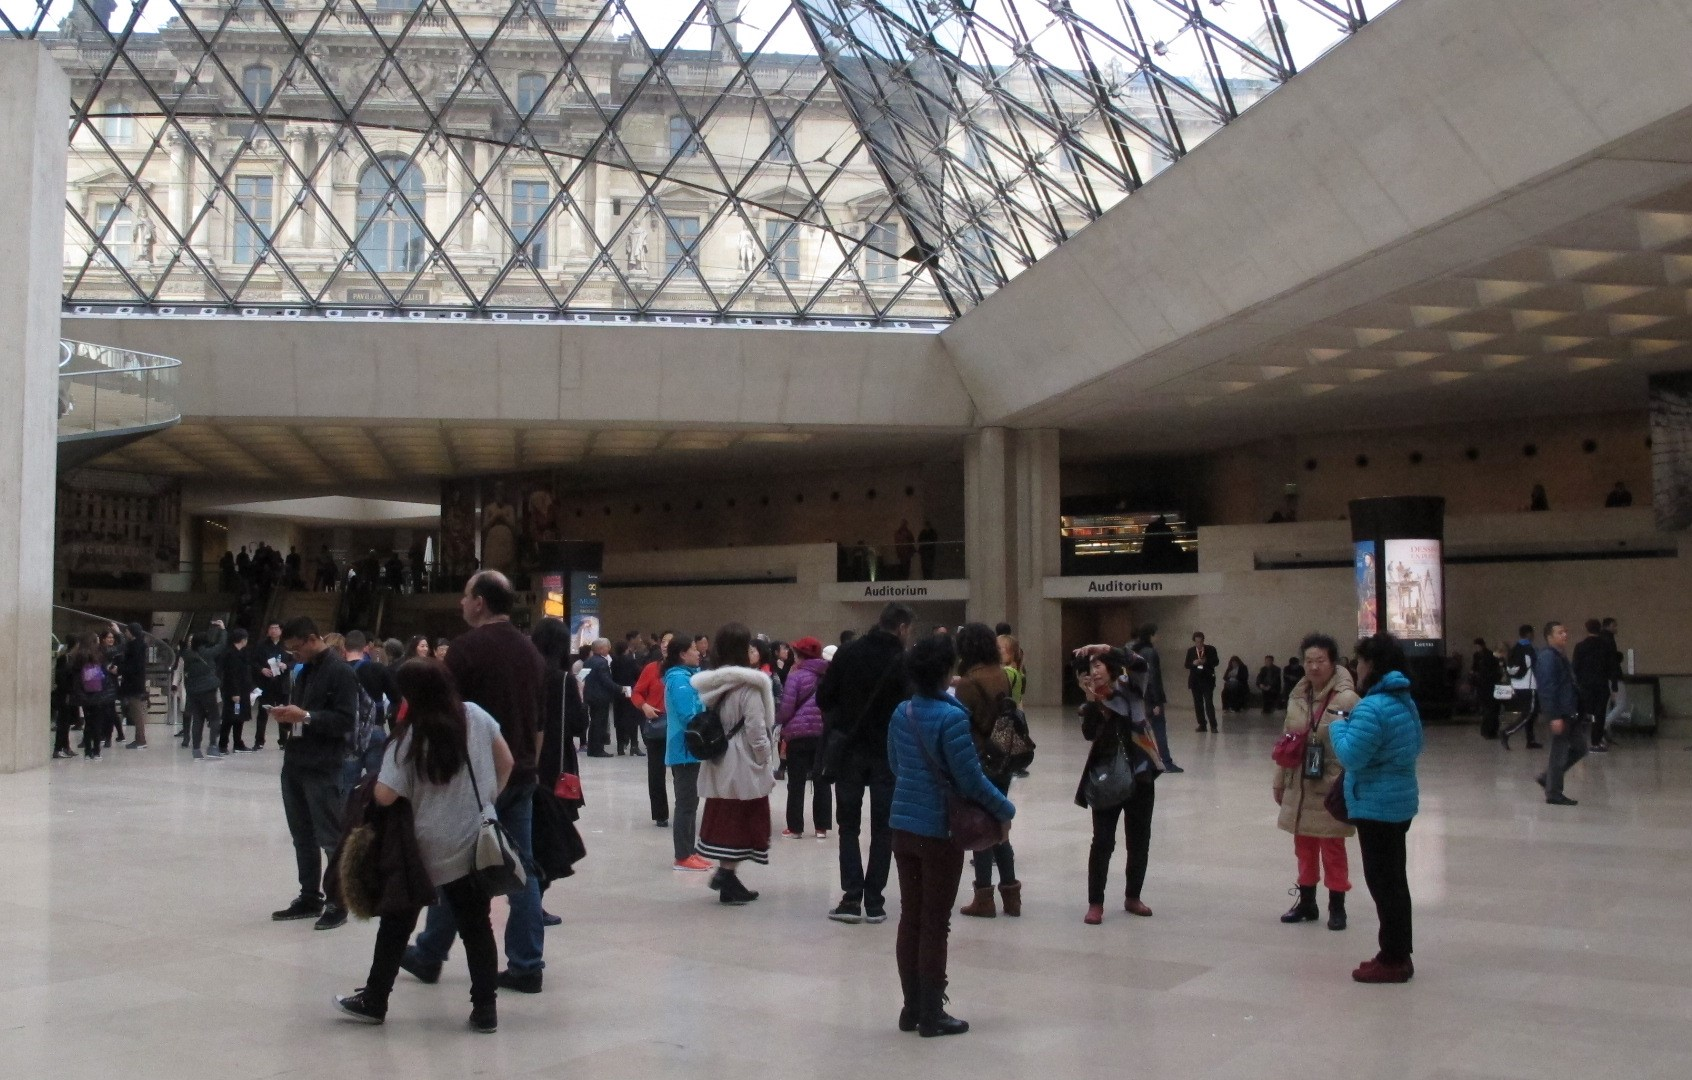 Antusias pengunjung yang tak pernah surut mengunjungi Louvre, menjadikan lokasi ini tempat berkumpul turis mancanegara.